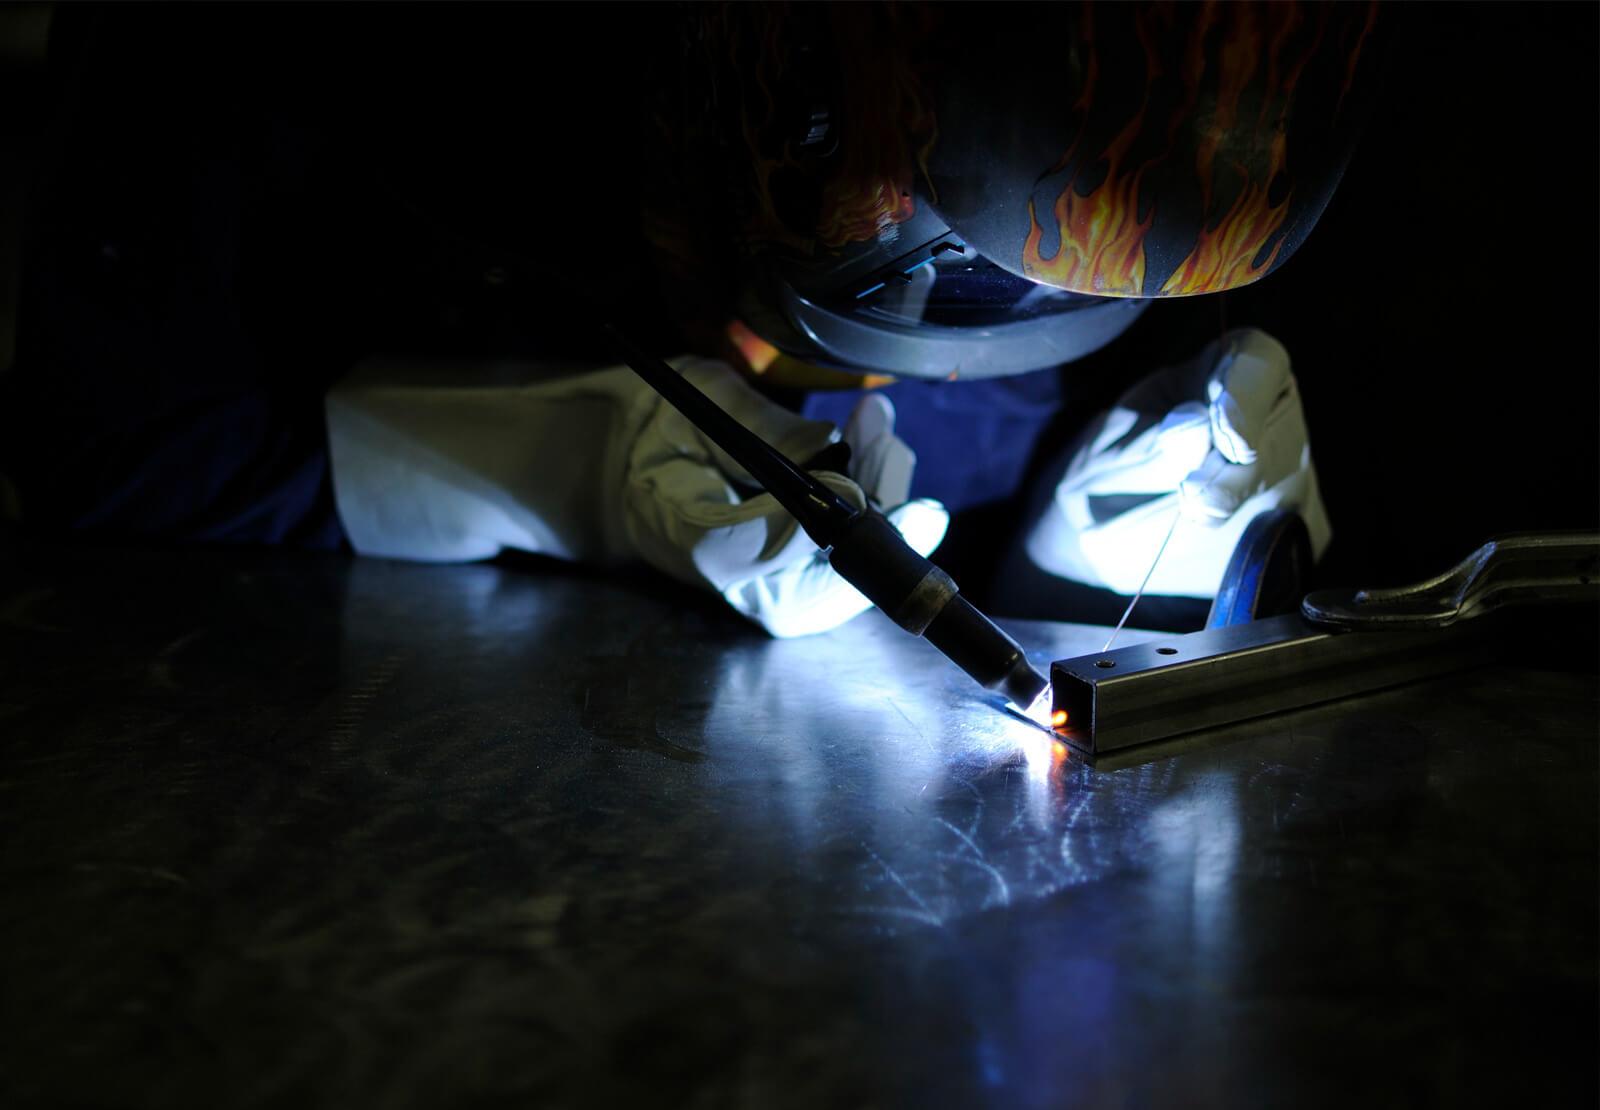 HEC showman welding tig